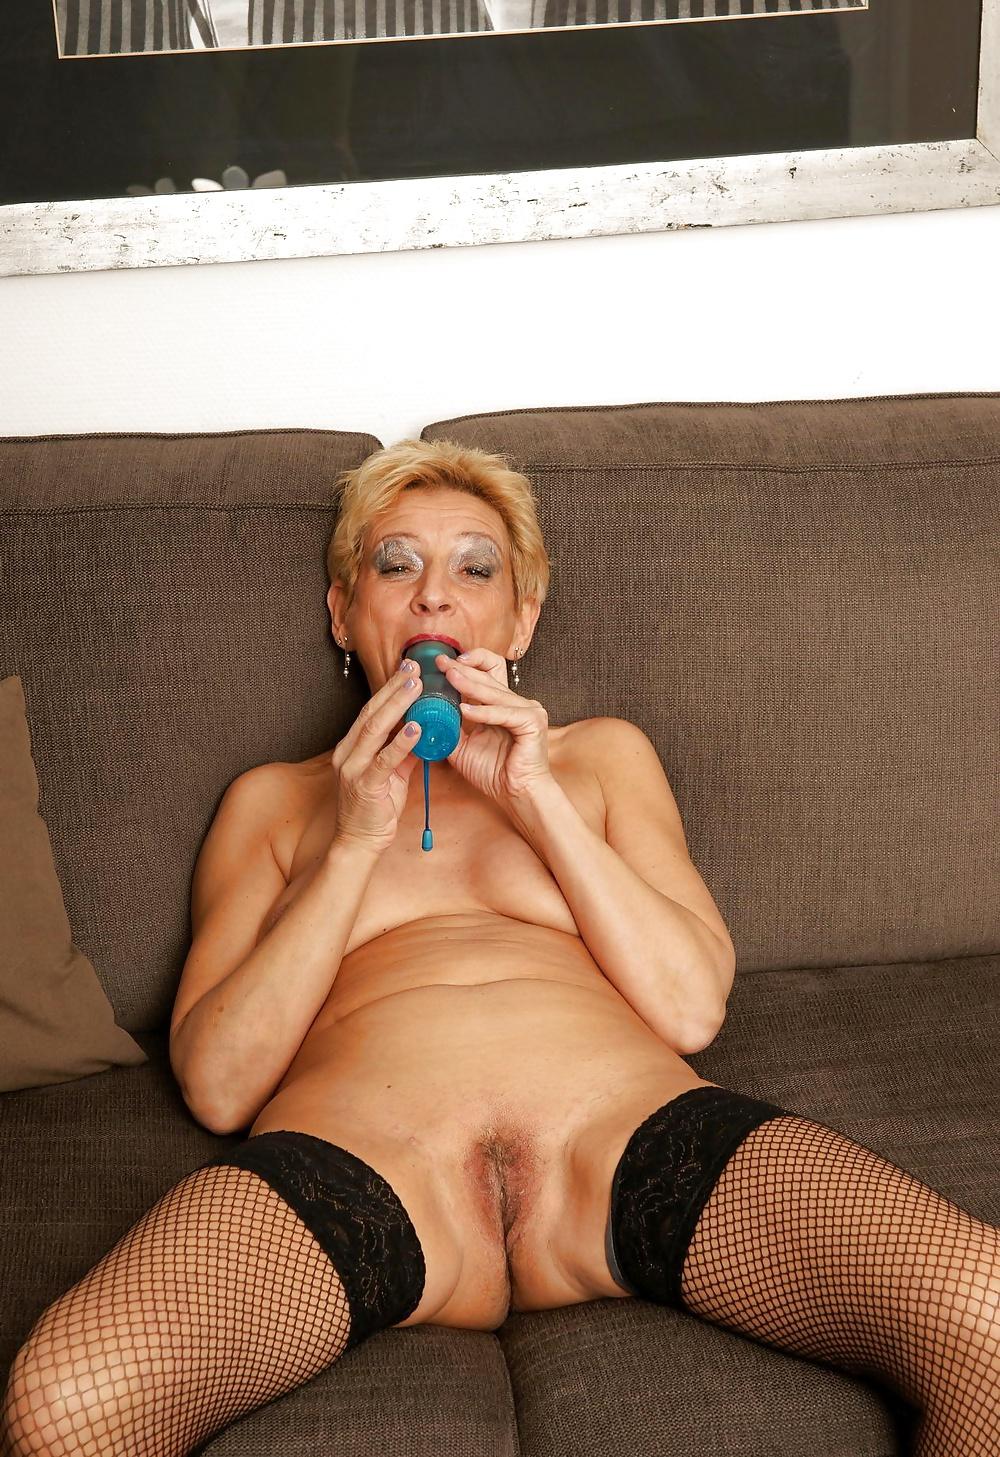 Free pics showing older women having sex in redhead mature porn pics